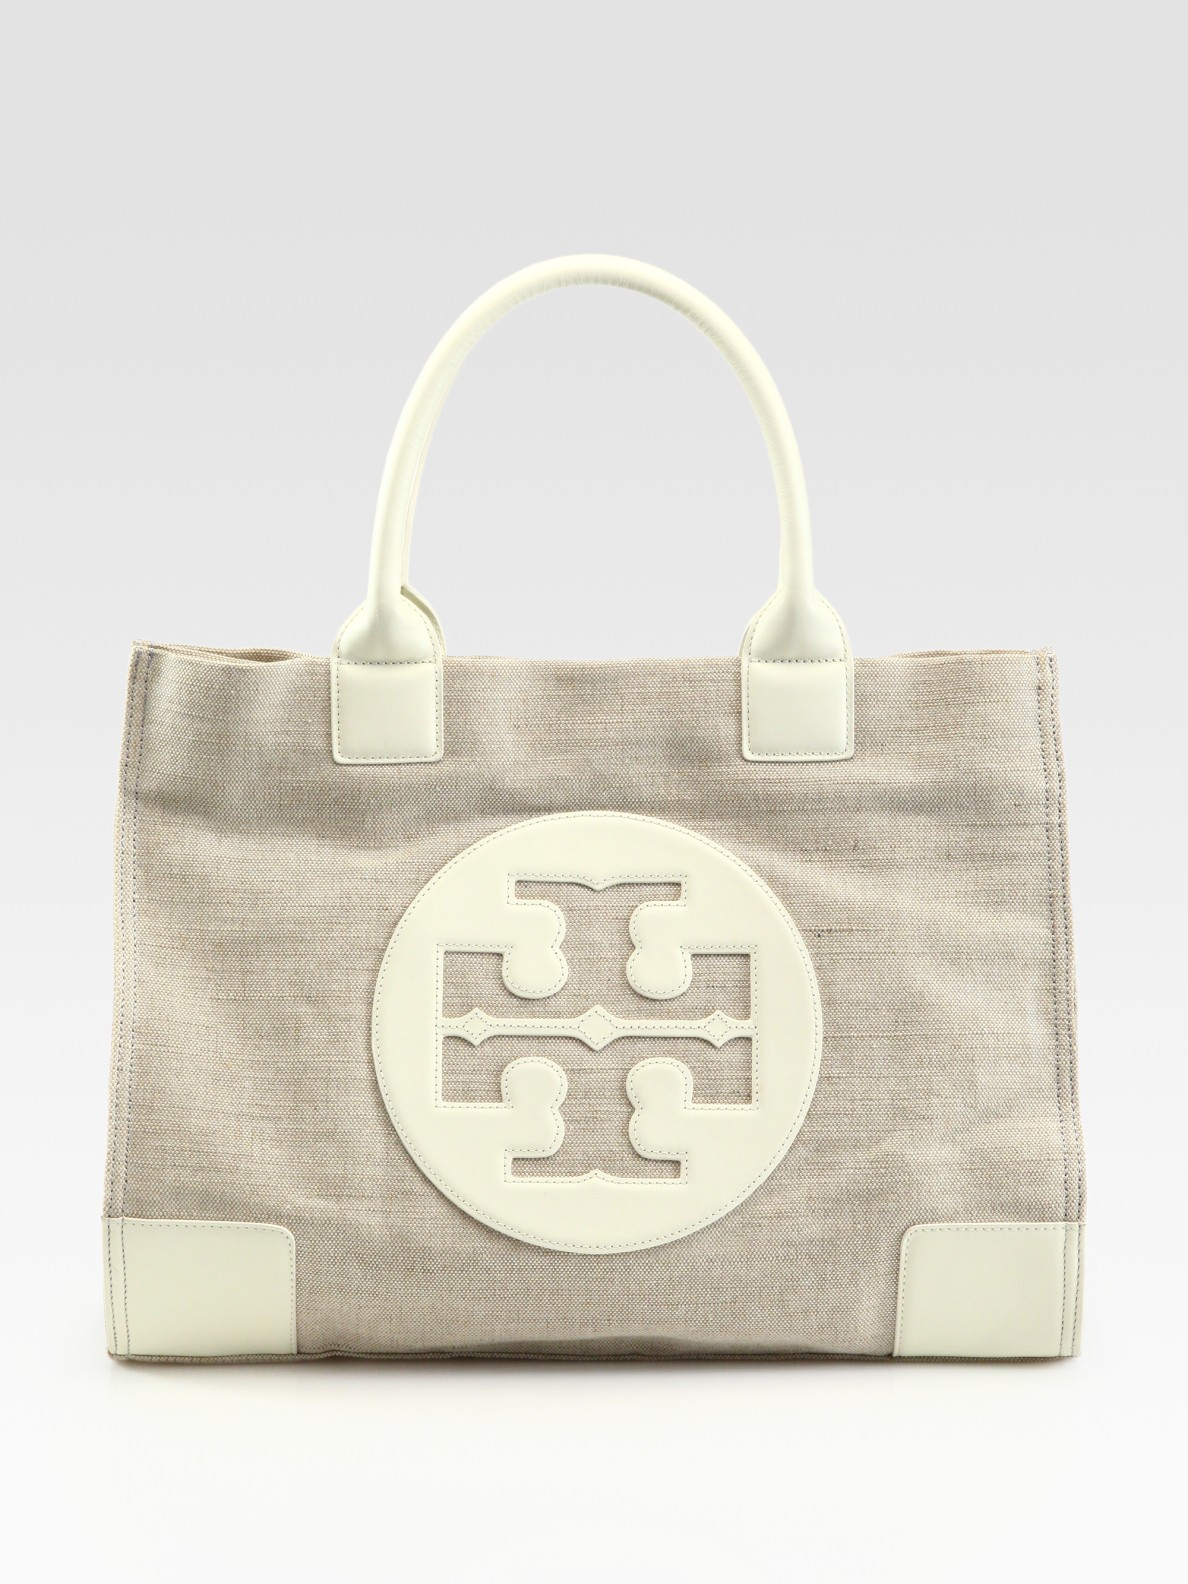 Tory Burch Ella Metallic Canvas Leather Tote Bag In